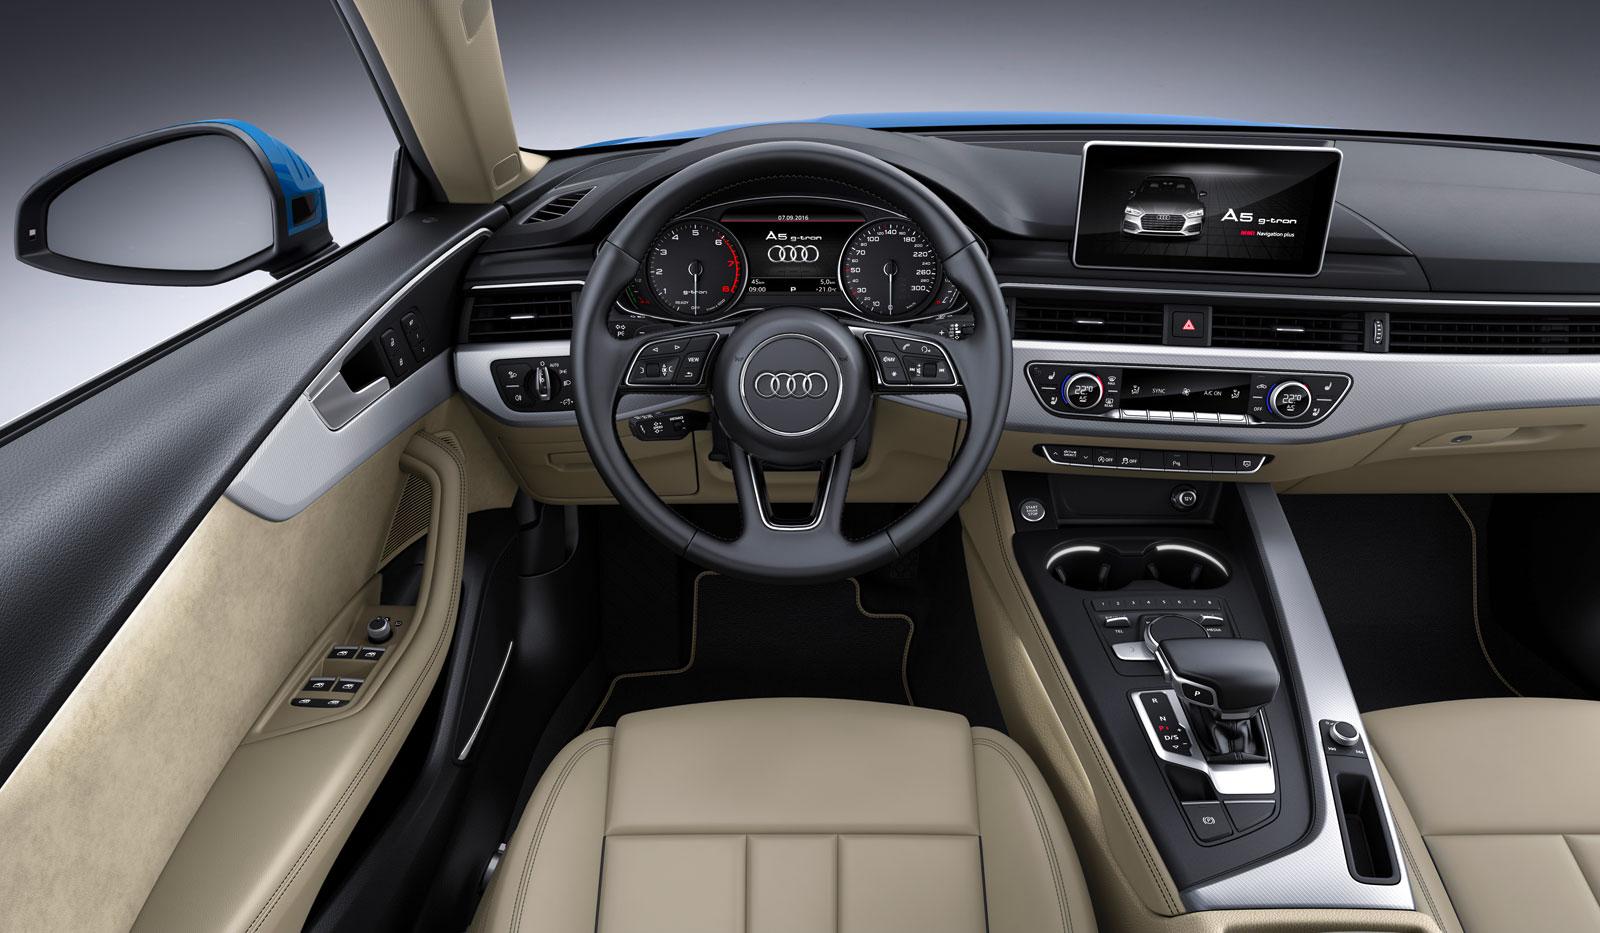 Audi A5 Sportback G Tron Interior